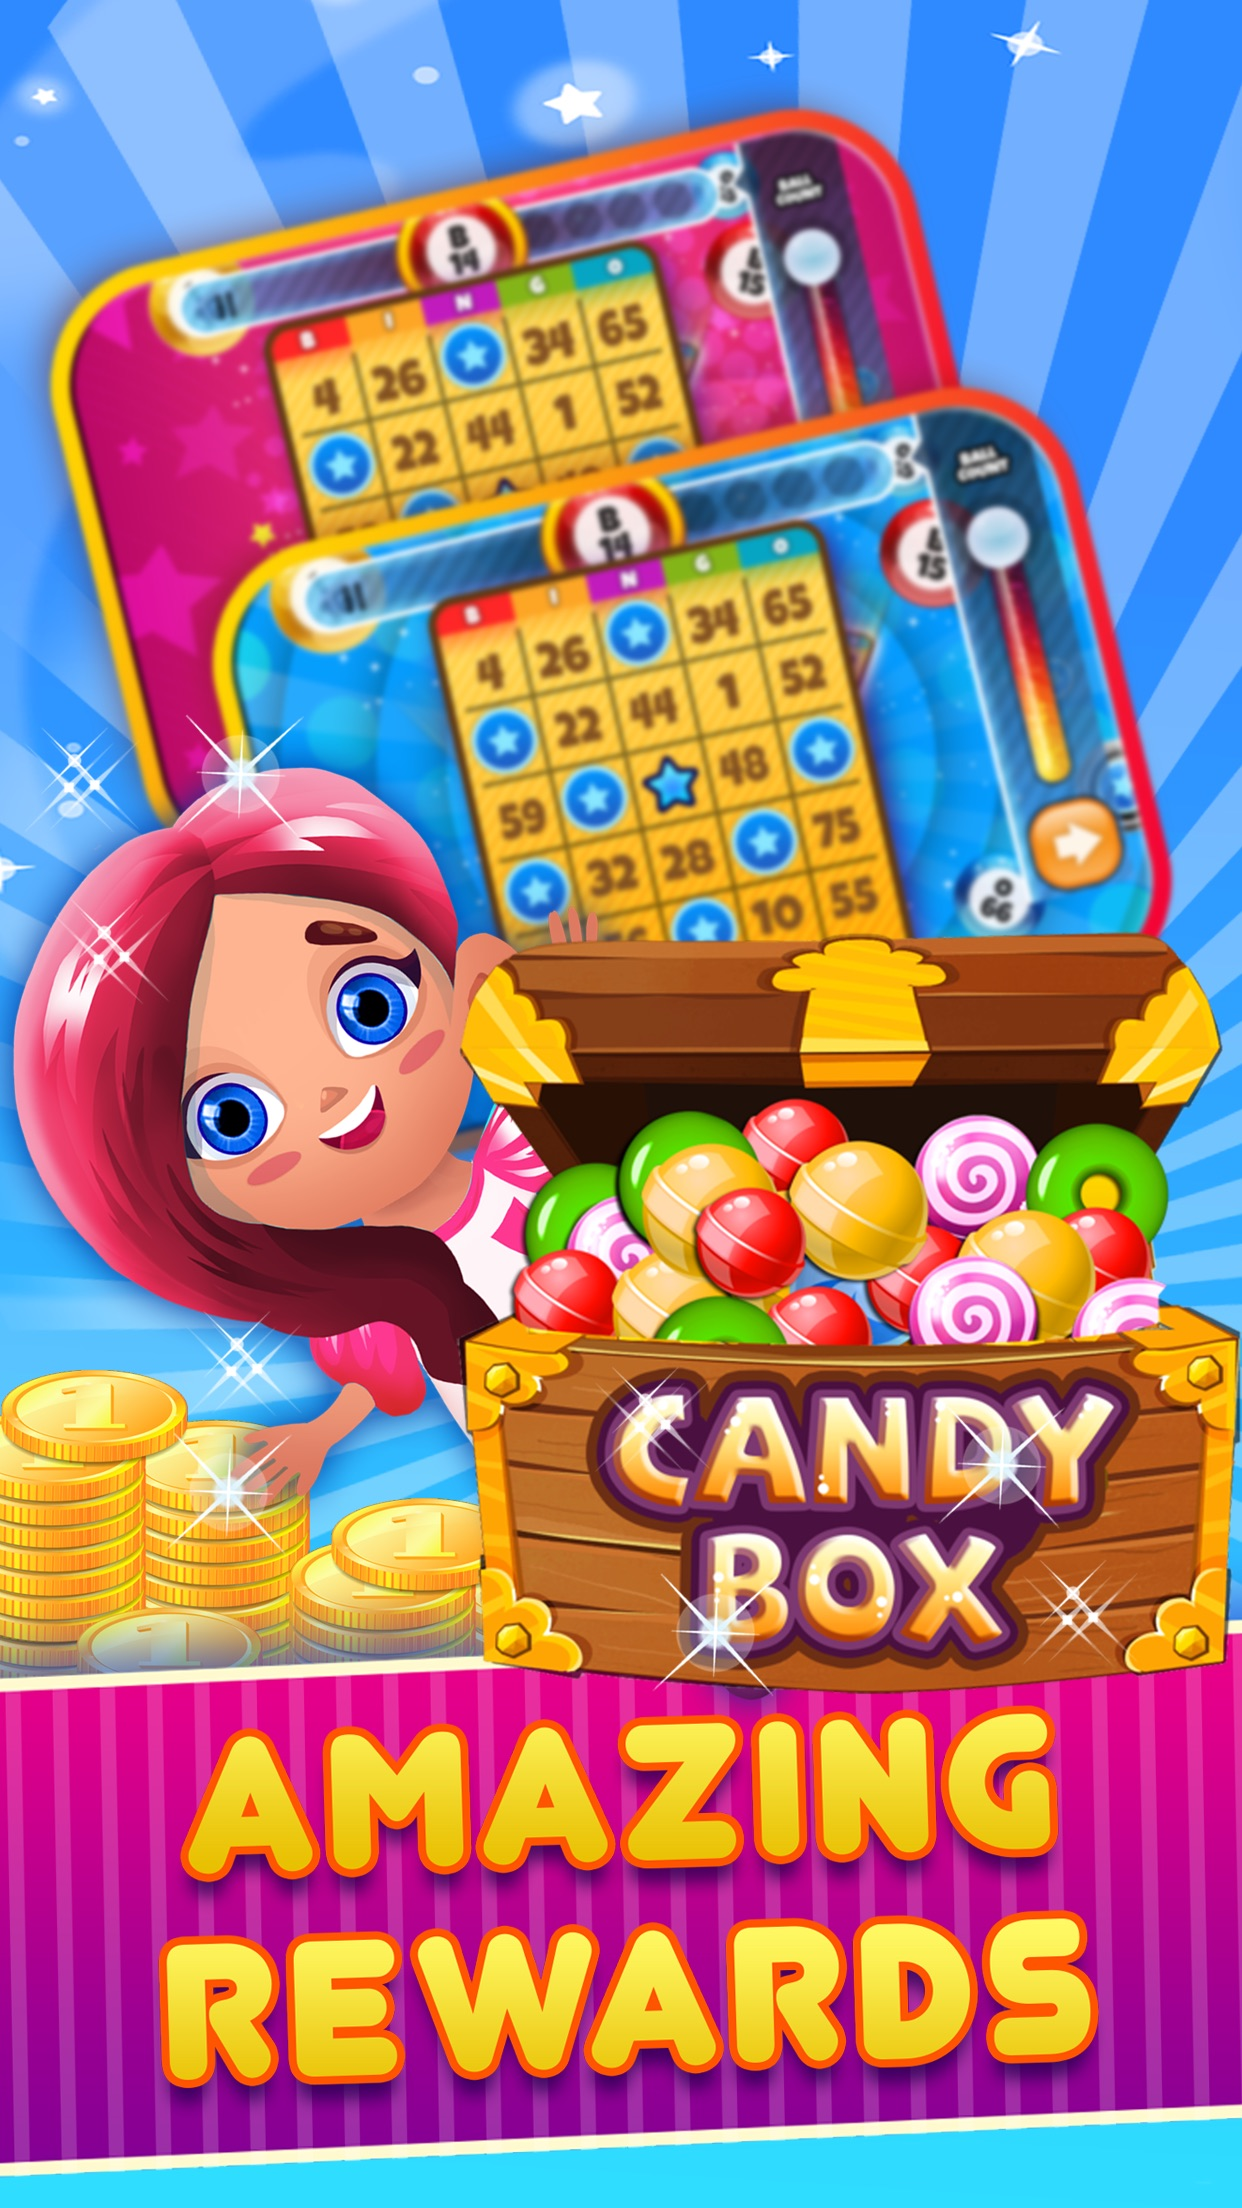 Bingo Candy Blast 2 - play big fish dab in pop party-land free Screenshot